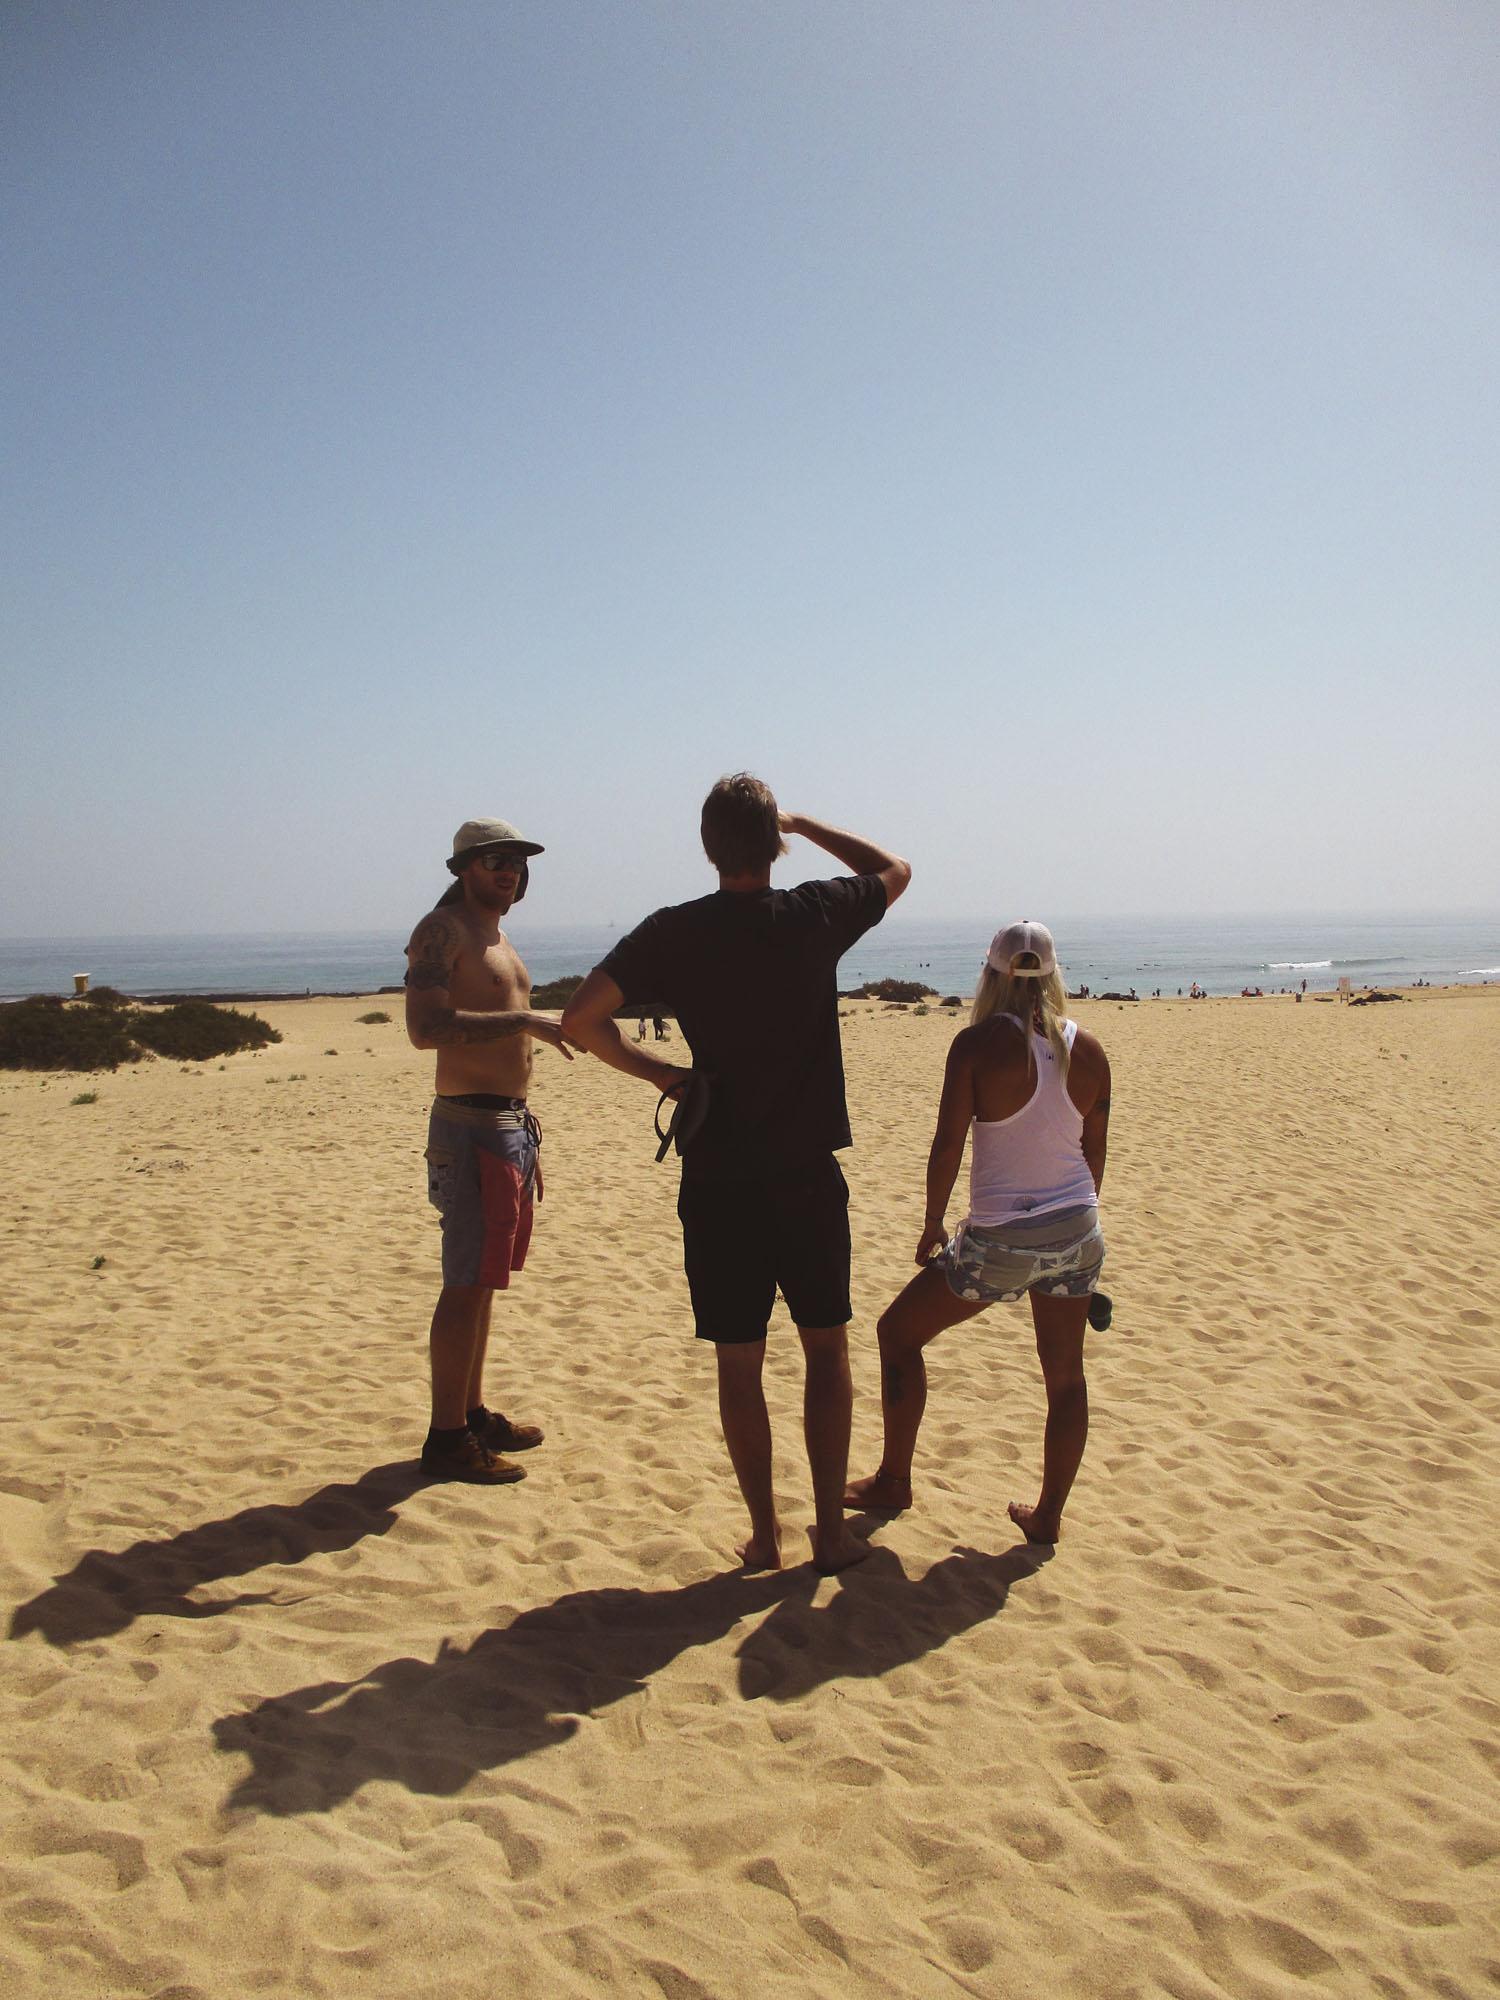 190224_Fuerteventura Kleine KameraIMG_2183.jpg